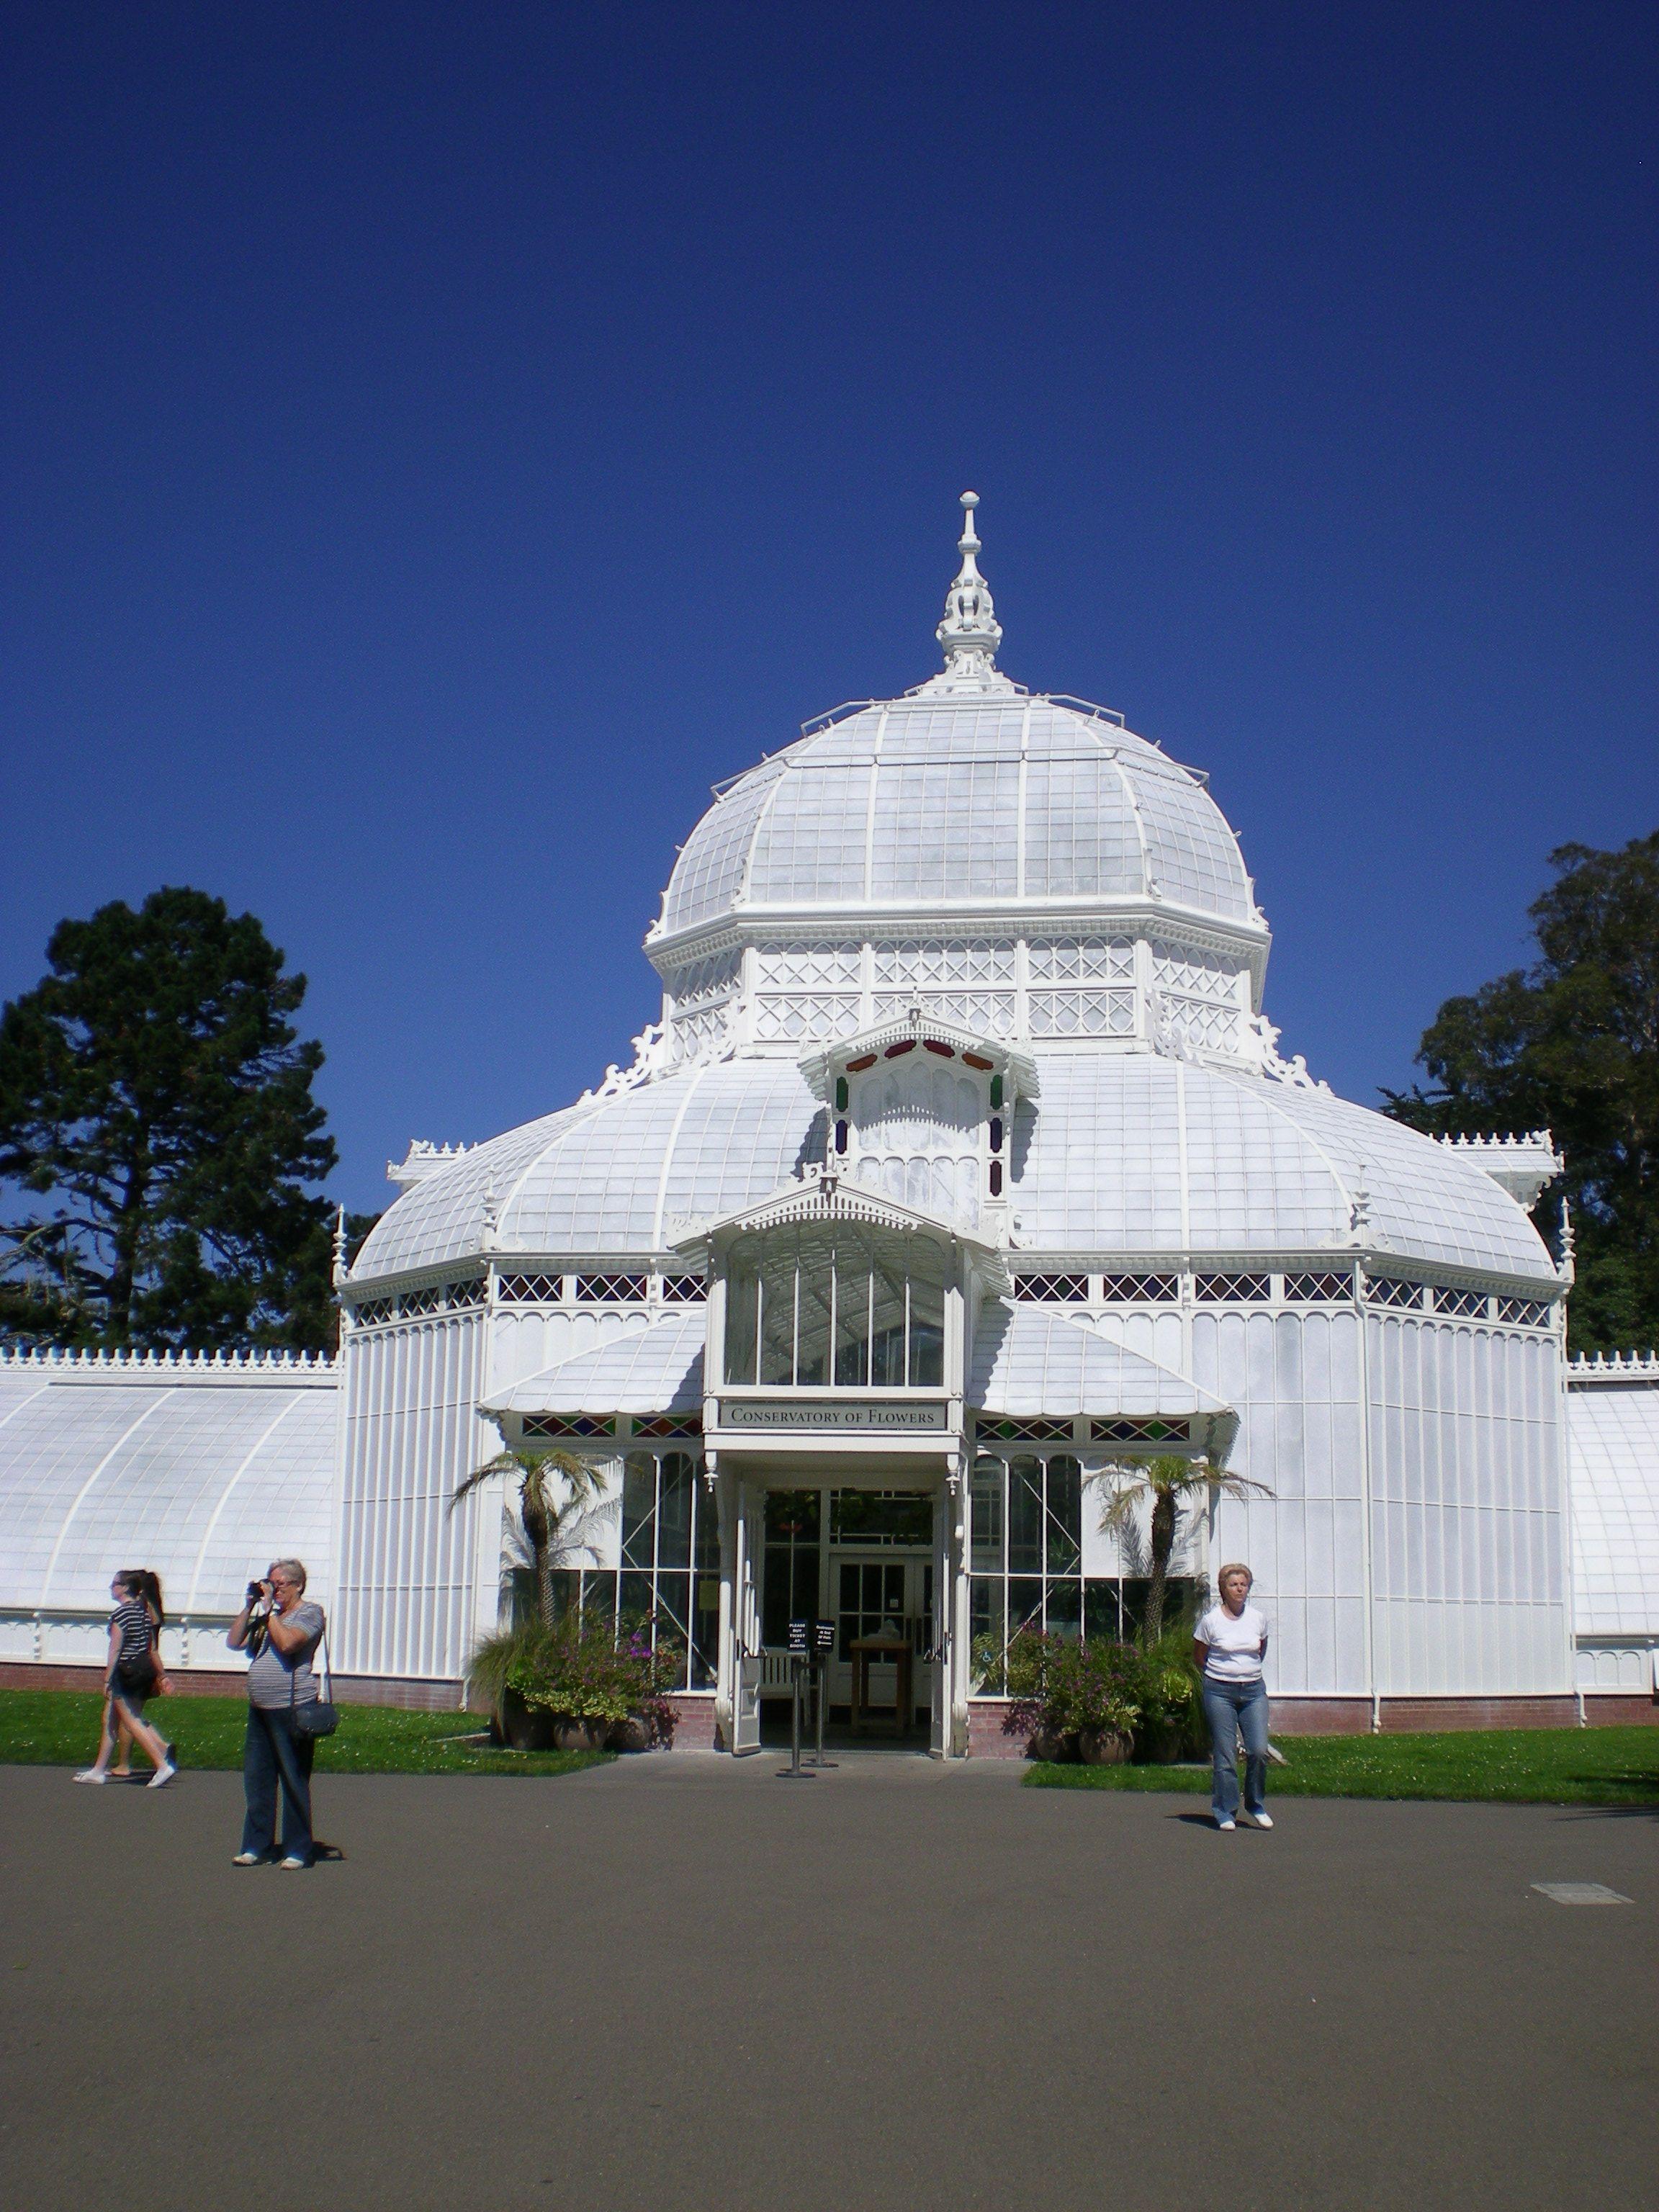 Conservatory Of Flowers At Golden Gate Park San Francisco